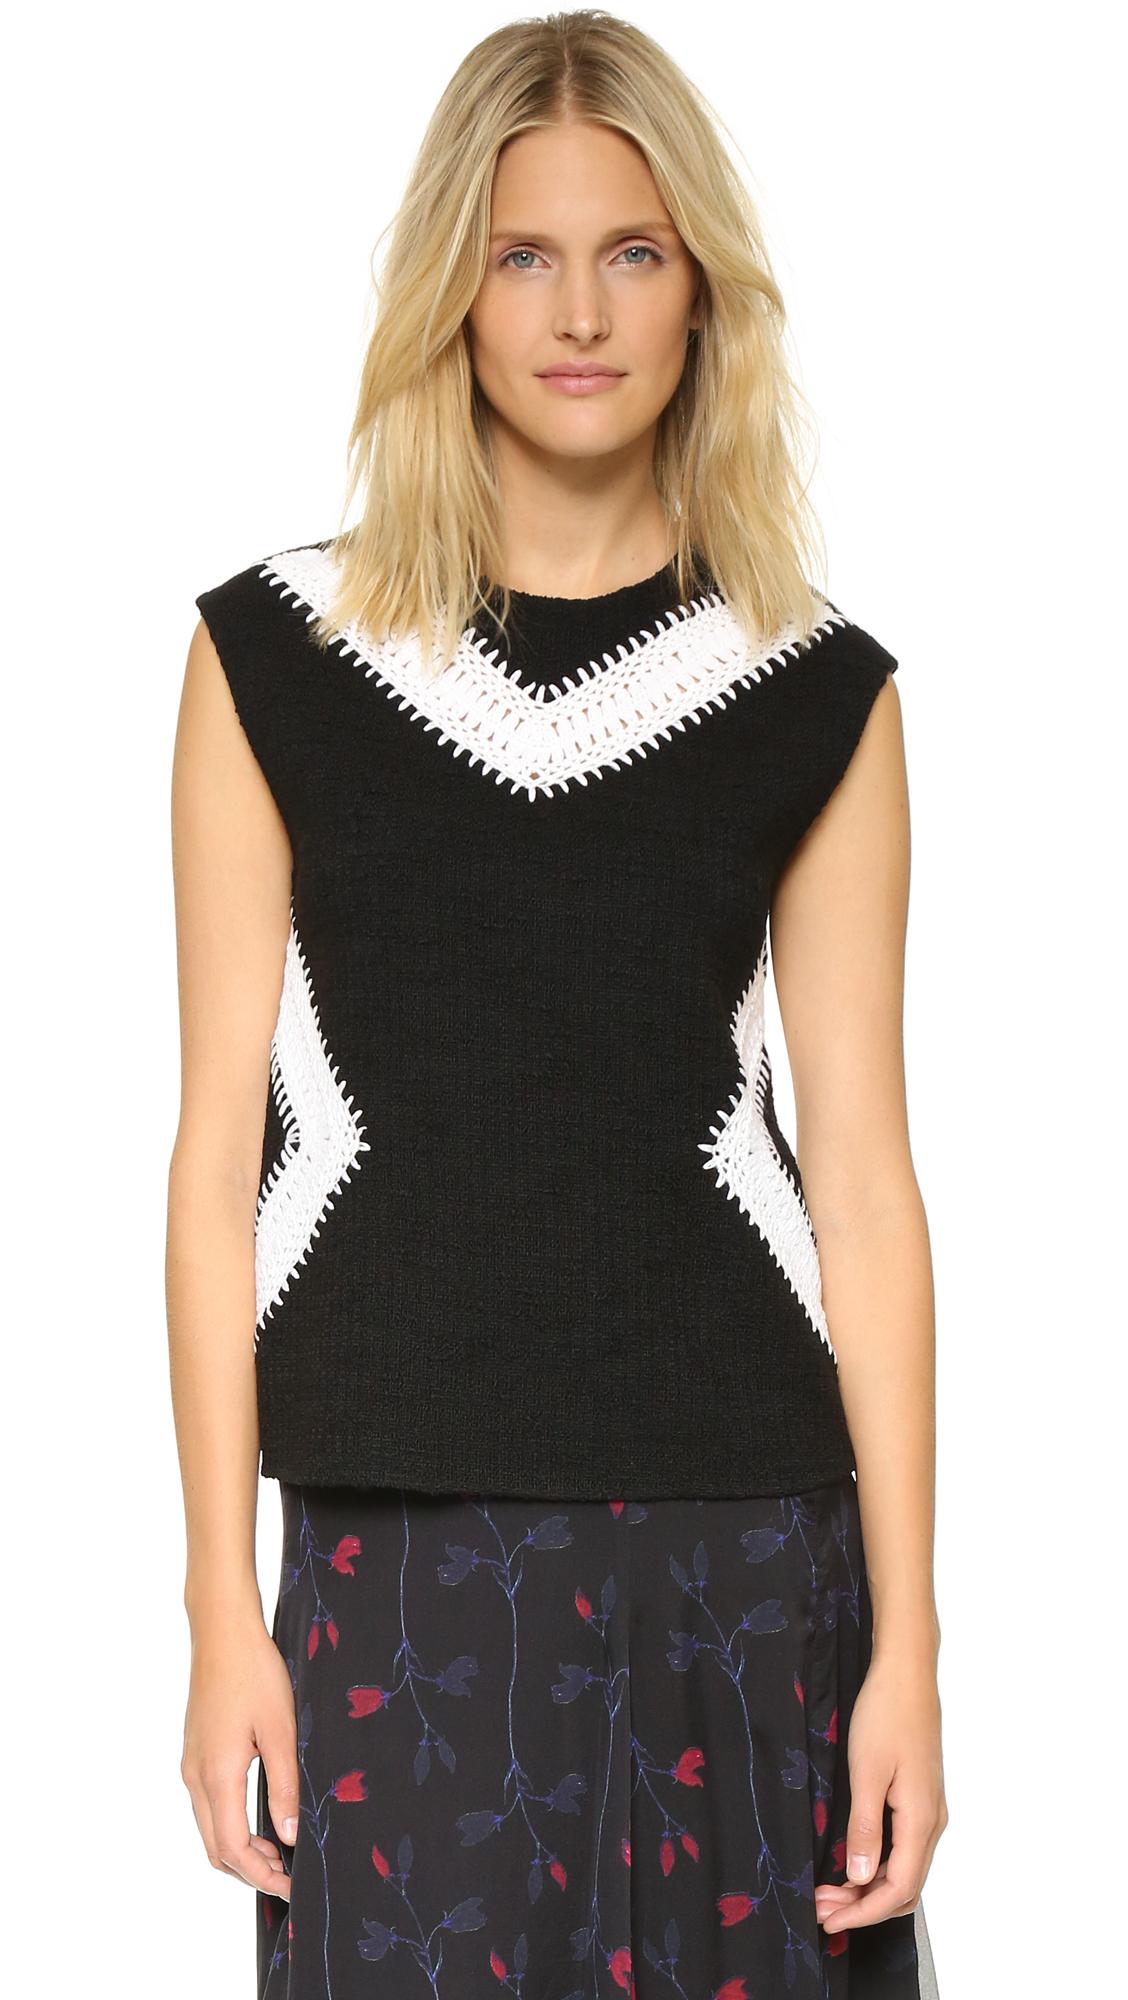 Thakoon Sleeveless Crochet Inset Top - Black at Shopbop